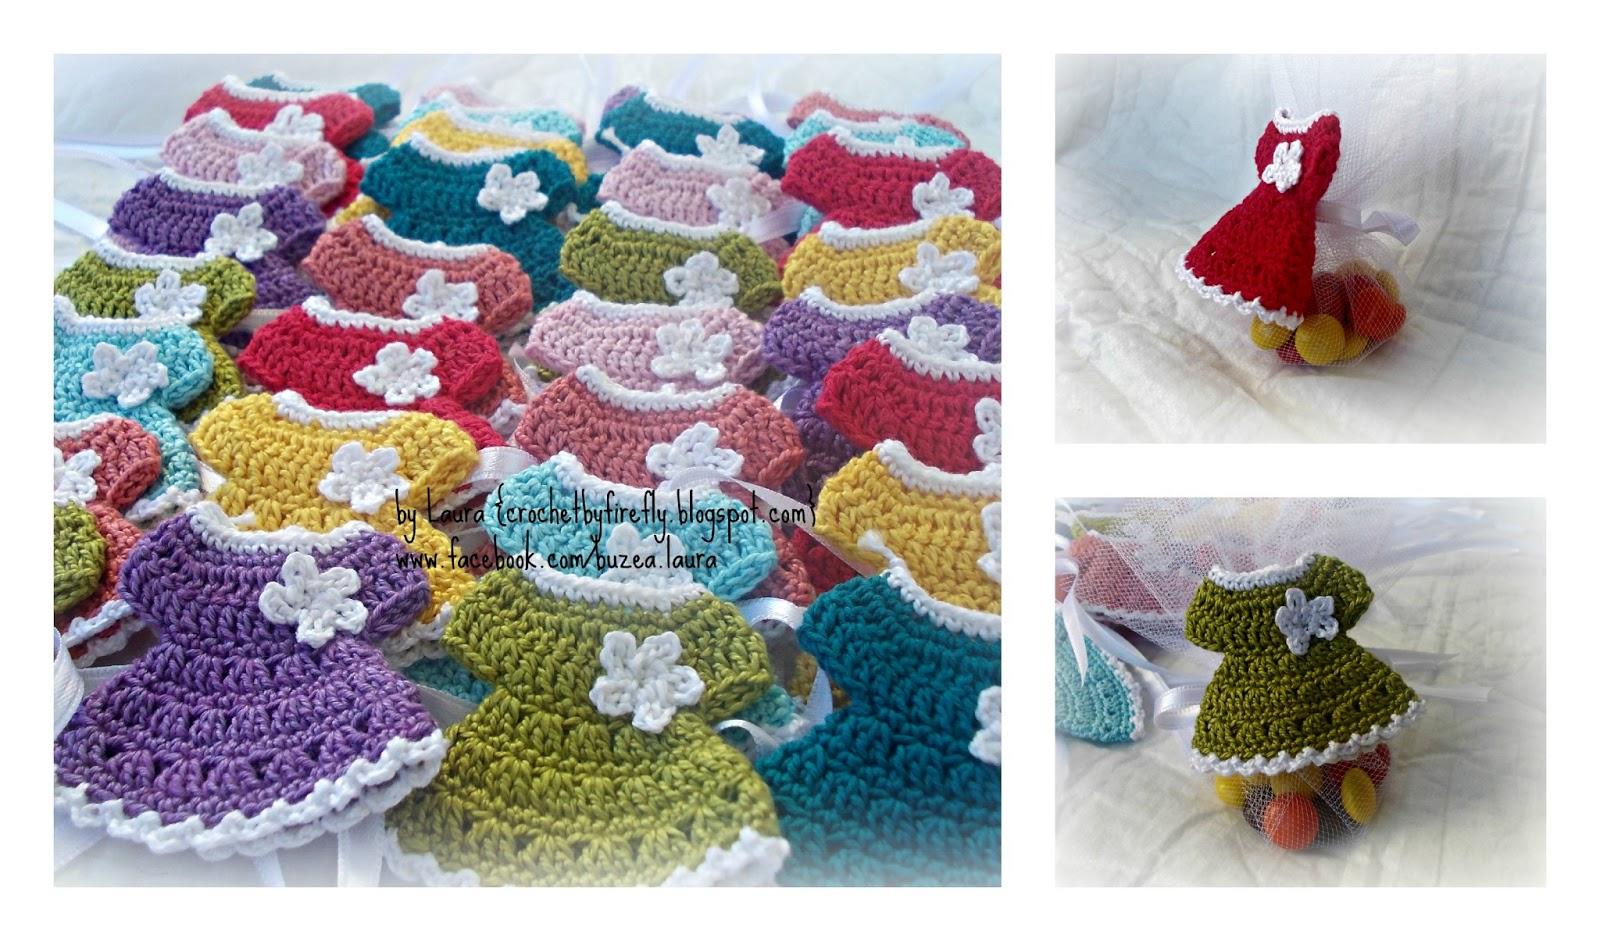 Fireflys Crochet Marturii Multe Marturii Gata